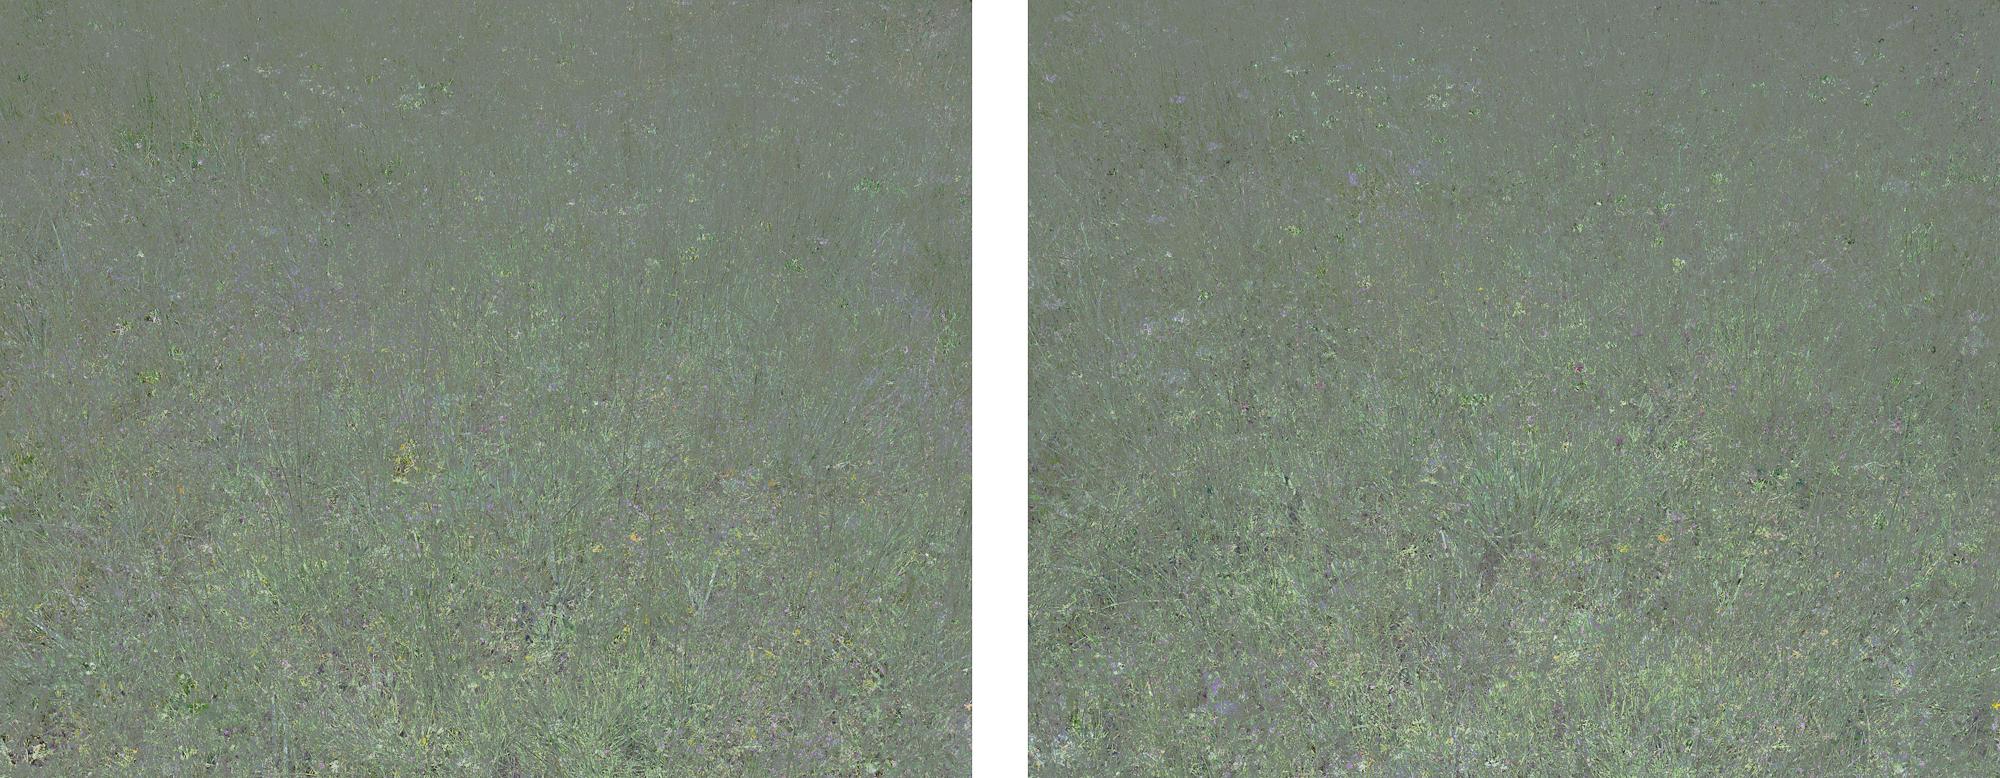 Untitled (Meadow 1) & Untitled (Meadow 2)